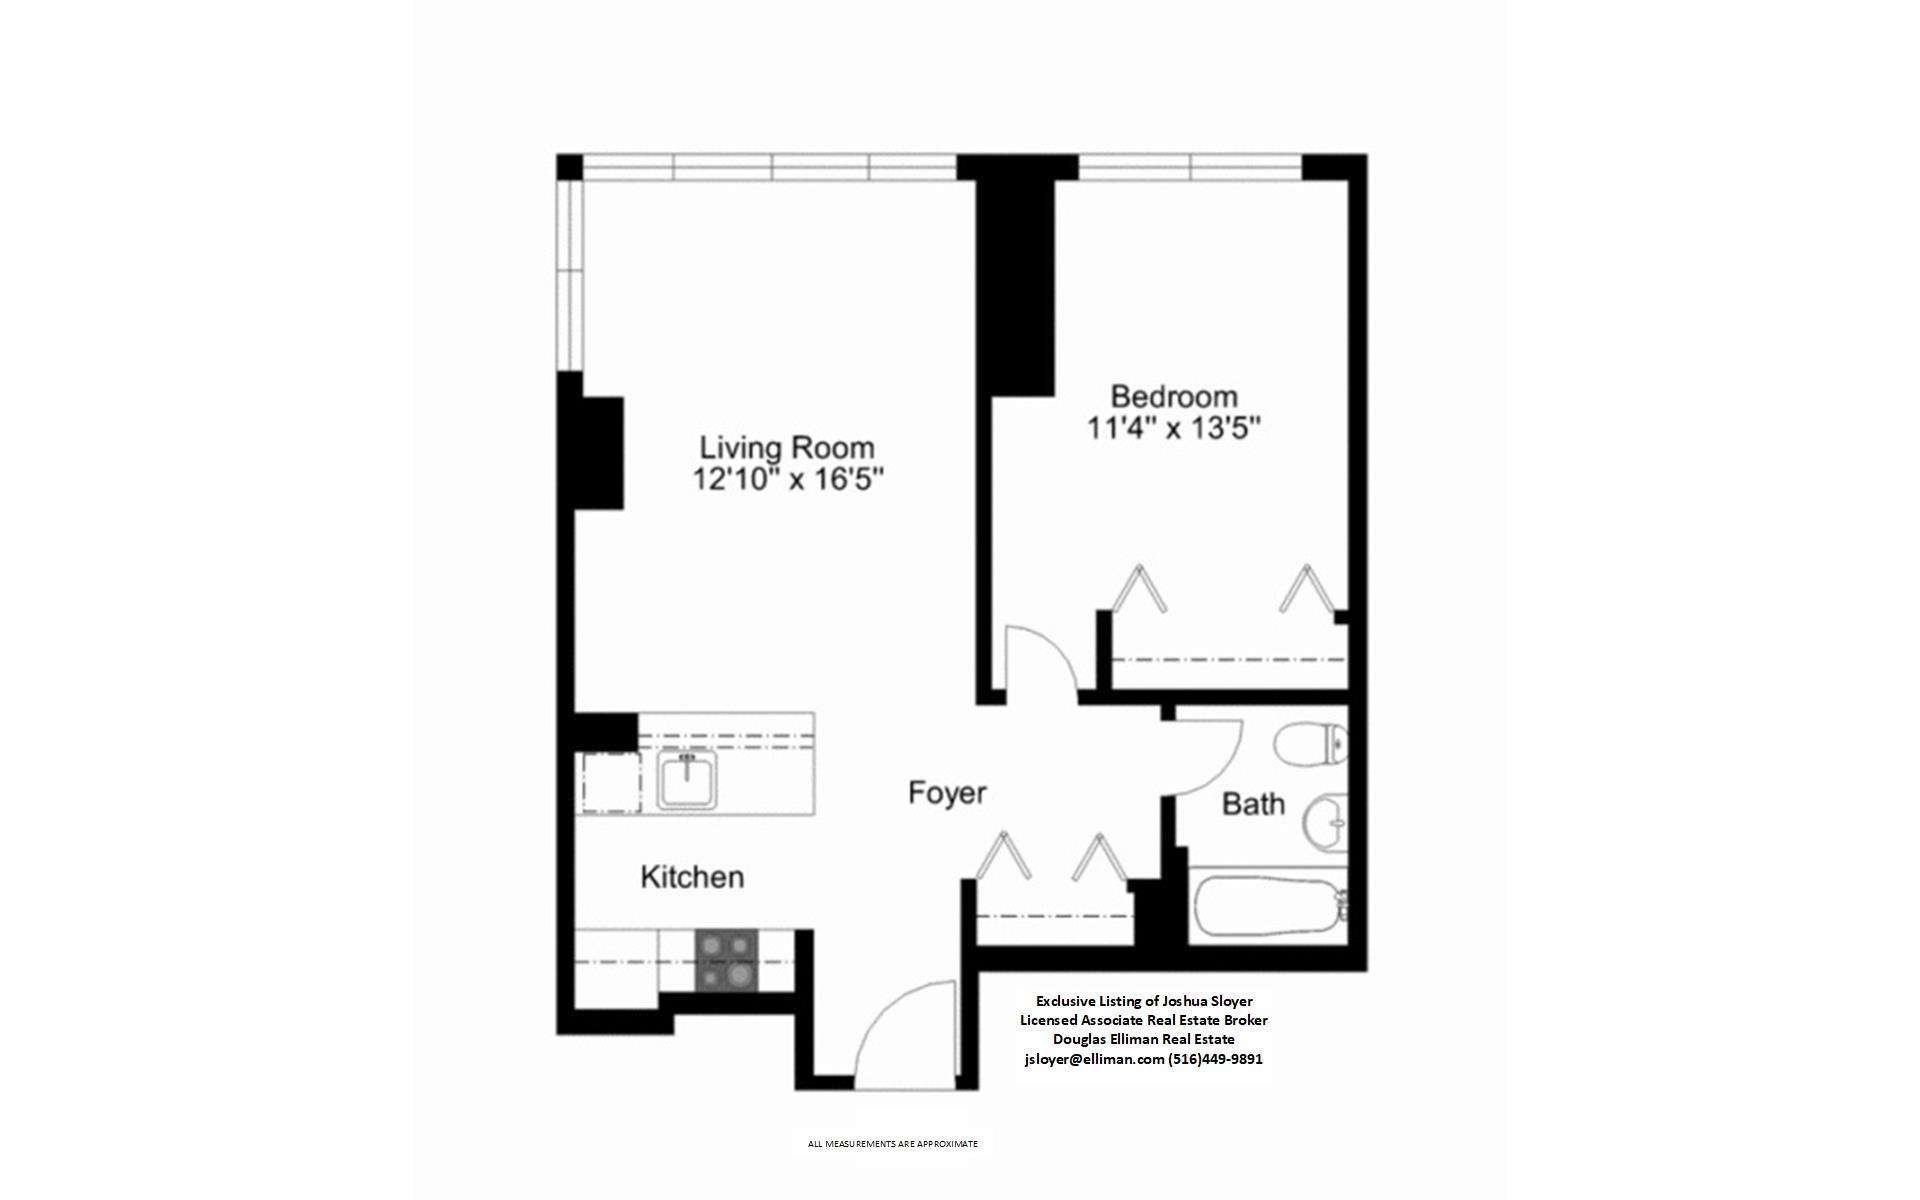 Floor plan of 350 West 42nd St, 26C - Clinton, New York